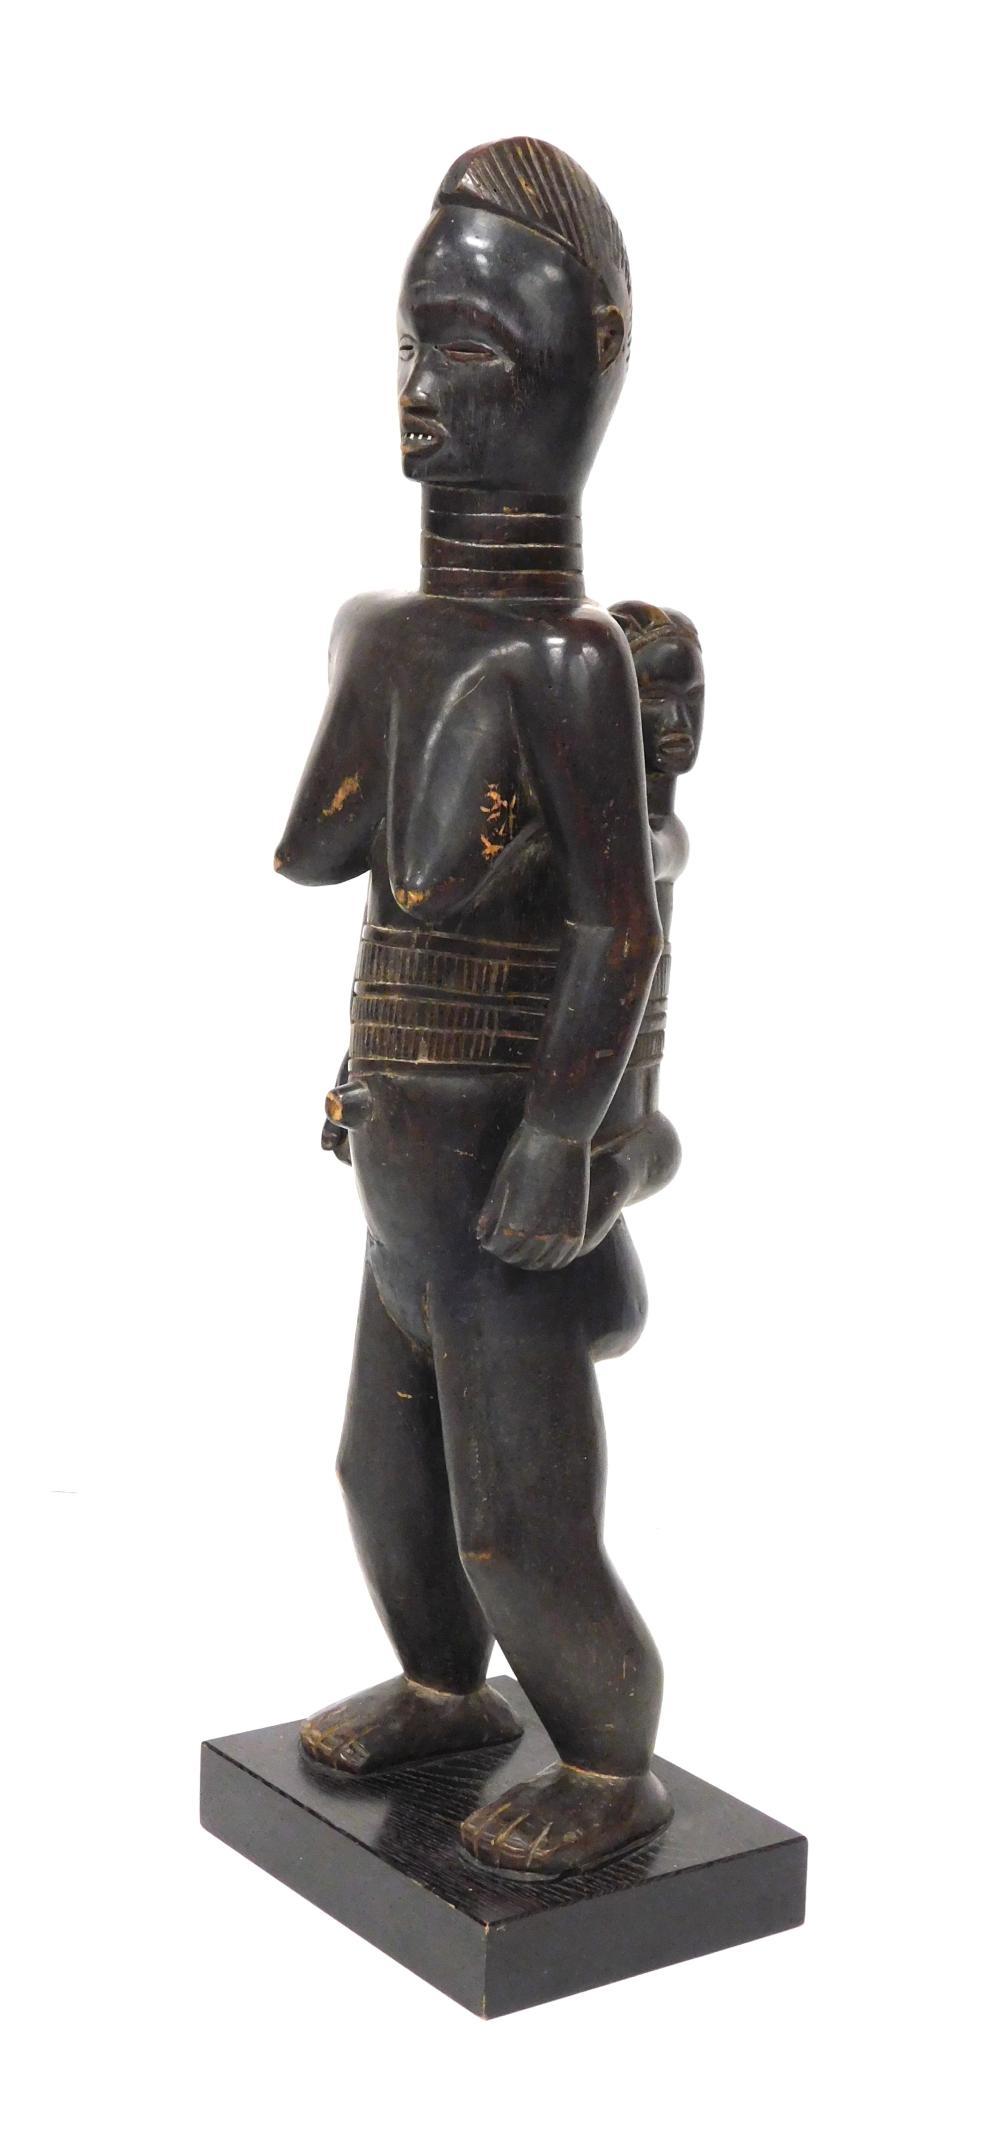 African Lü Me Maternite figure, Dan Tribe, Ivory Coast, Liberia, Henri Kamer provenance, c. 1940, dark patina carved wood, metal tee...